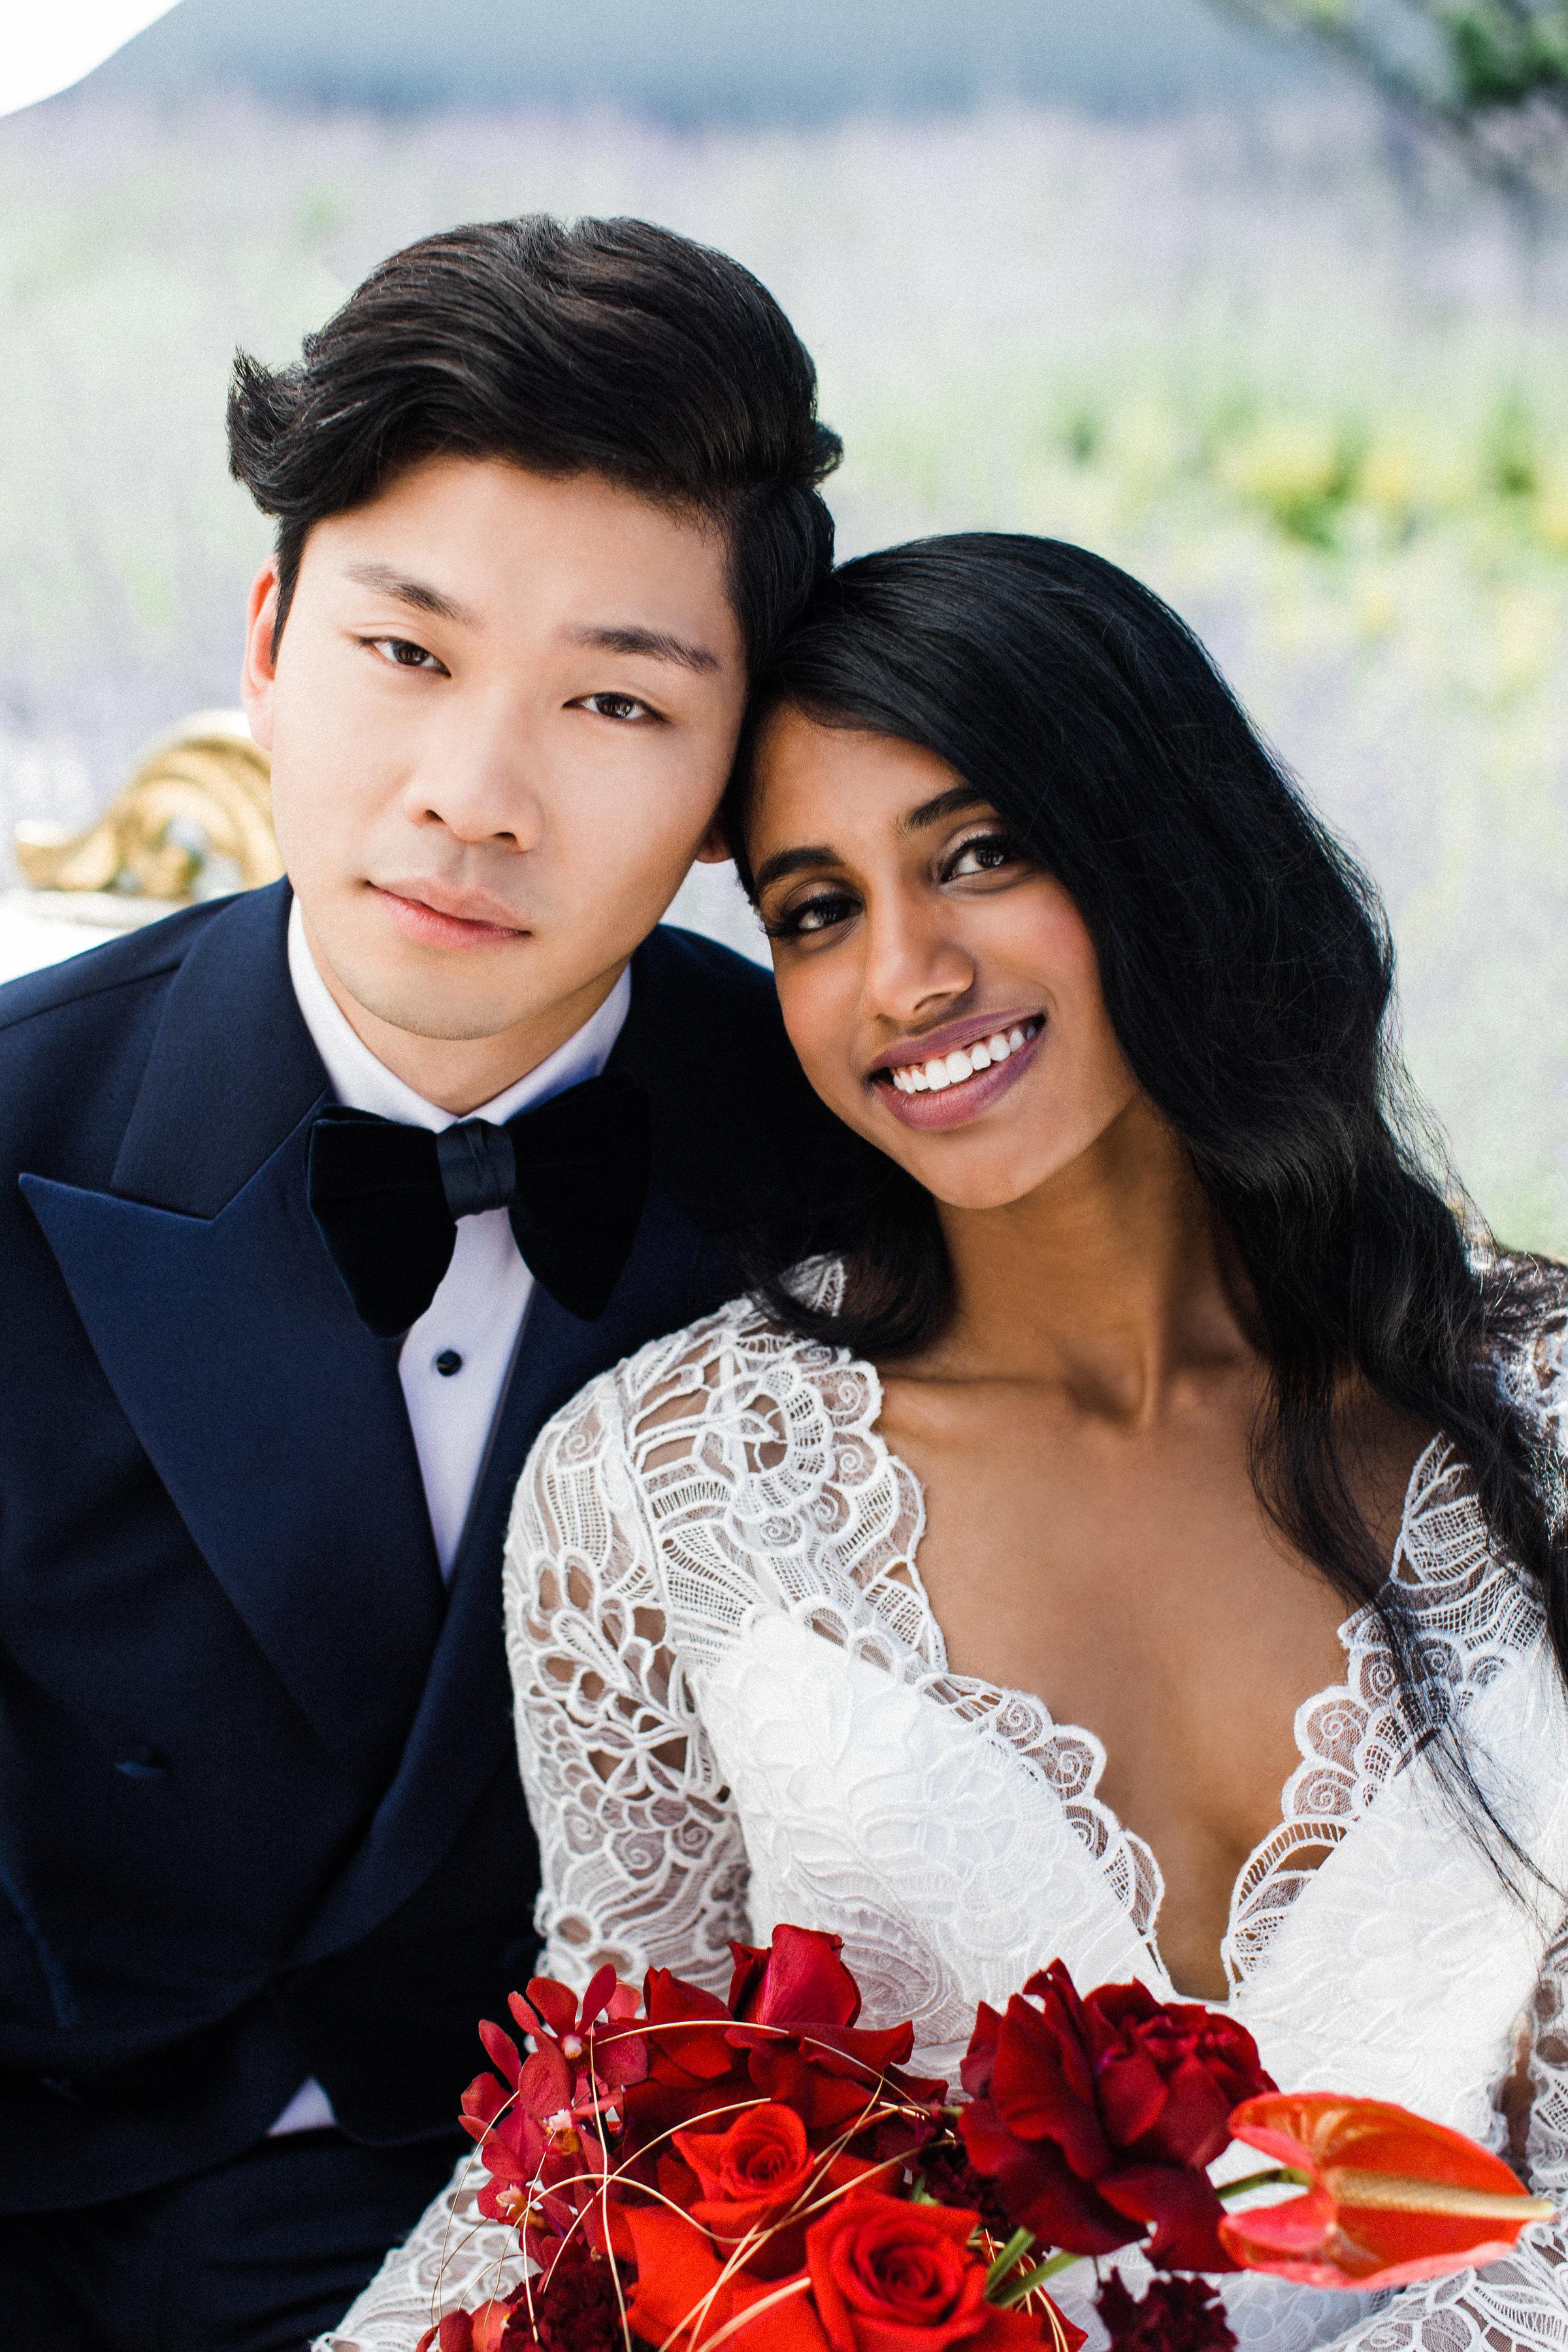 August In Bloom - Smiling bride and groom - Scarlet Sweetheart (Lavish Dulhan)